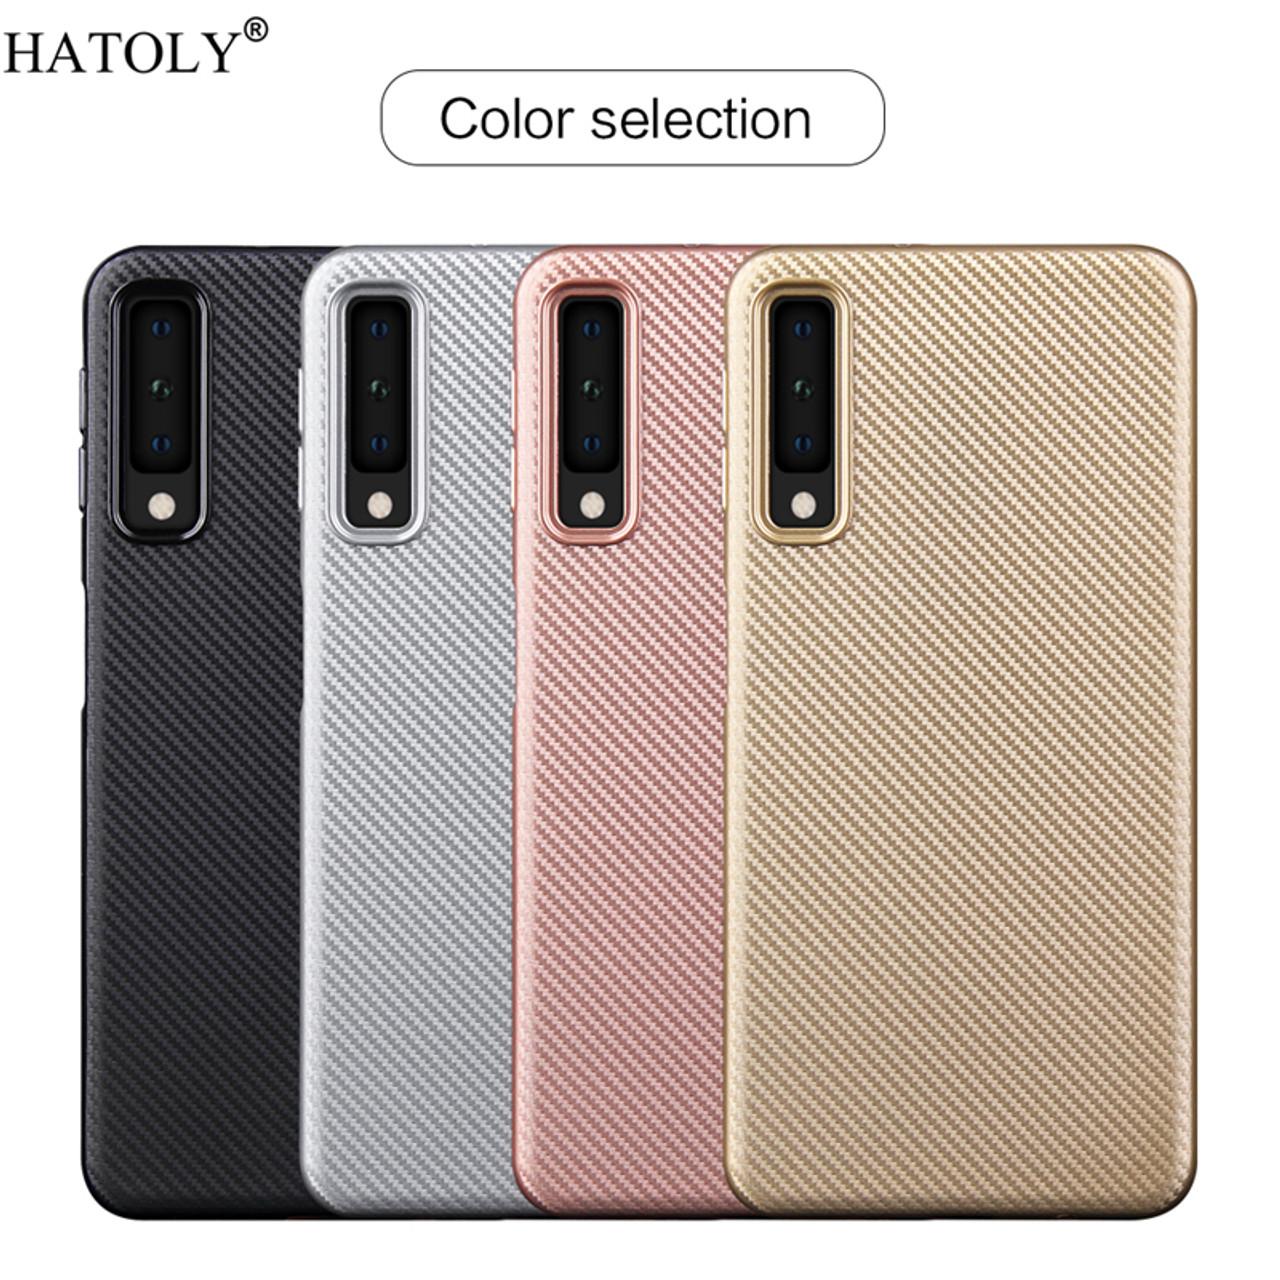 size 40 1f948 2628c sFor Phone Case Samsung Galaxy A7 2018 Case Rubber Armor Phone Cover For  Samsung A7 2018 Case For Samsung Galaxy A7 2018 A750